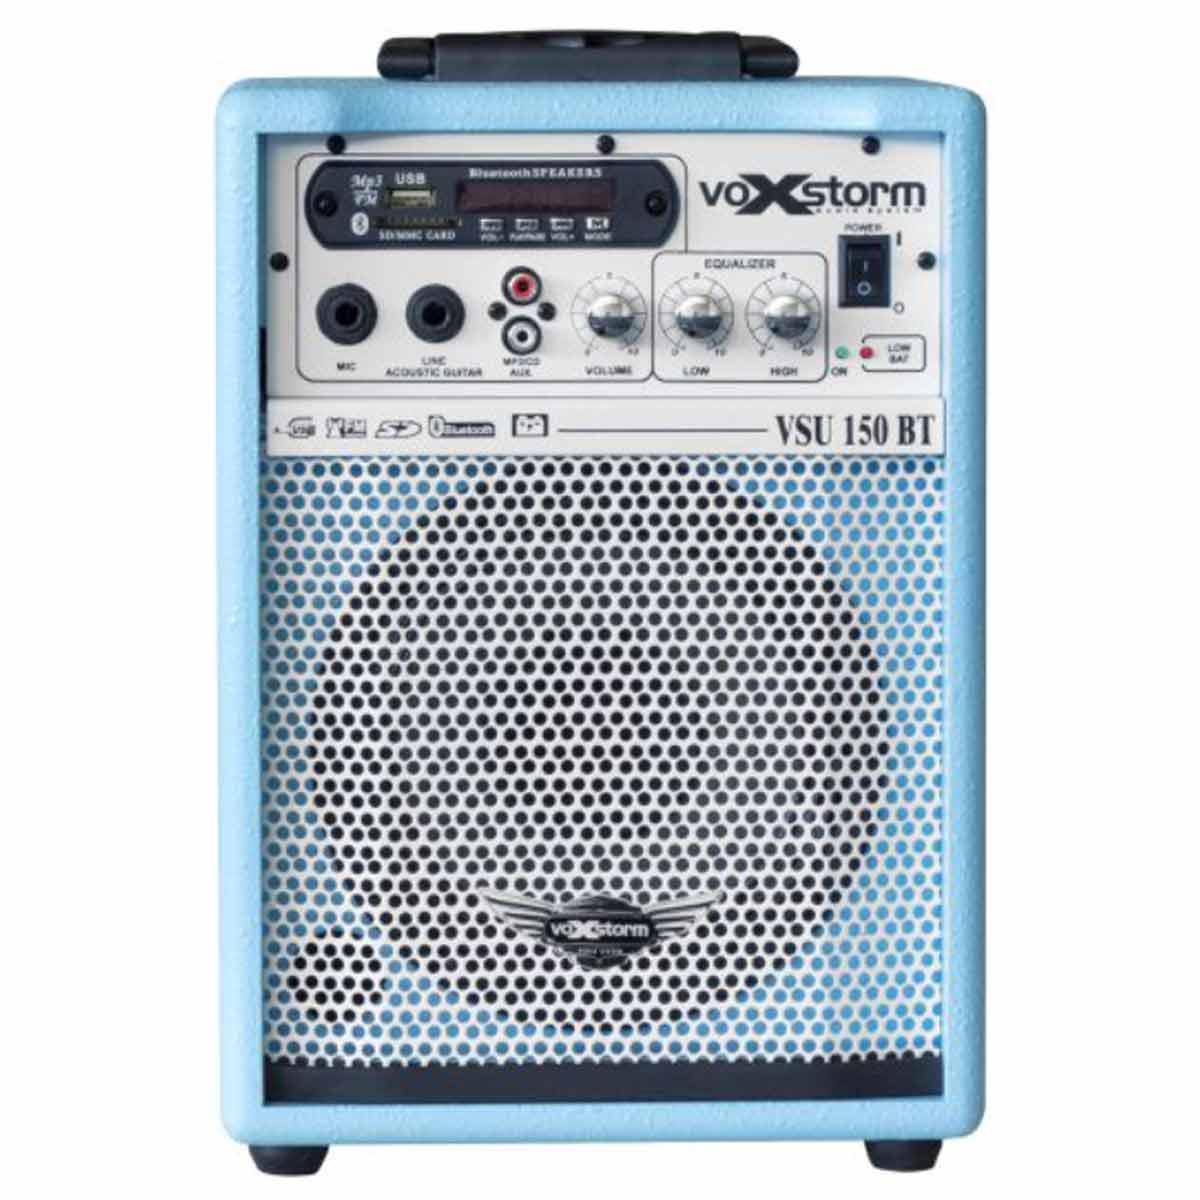 VSU150BT - Cubo Multiuso Ativo 15W c/ Bateria Interna, Bluetooth e USB VSU 150 BT Azul - Voxstorm